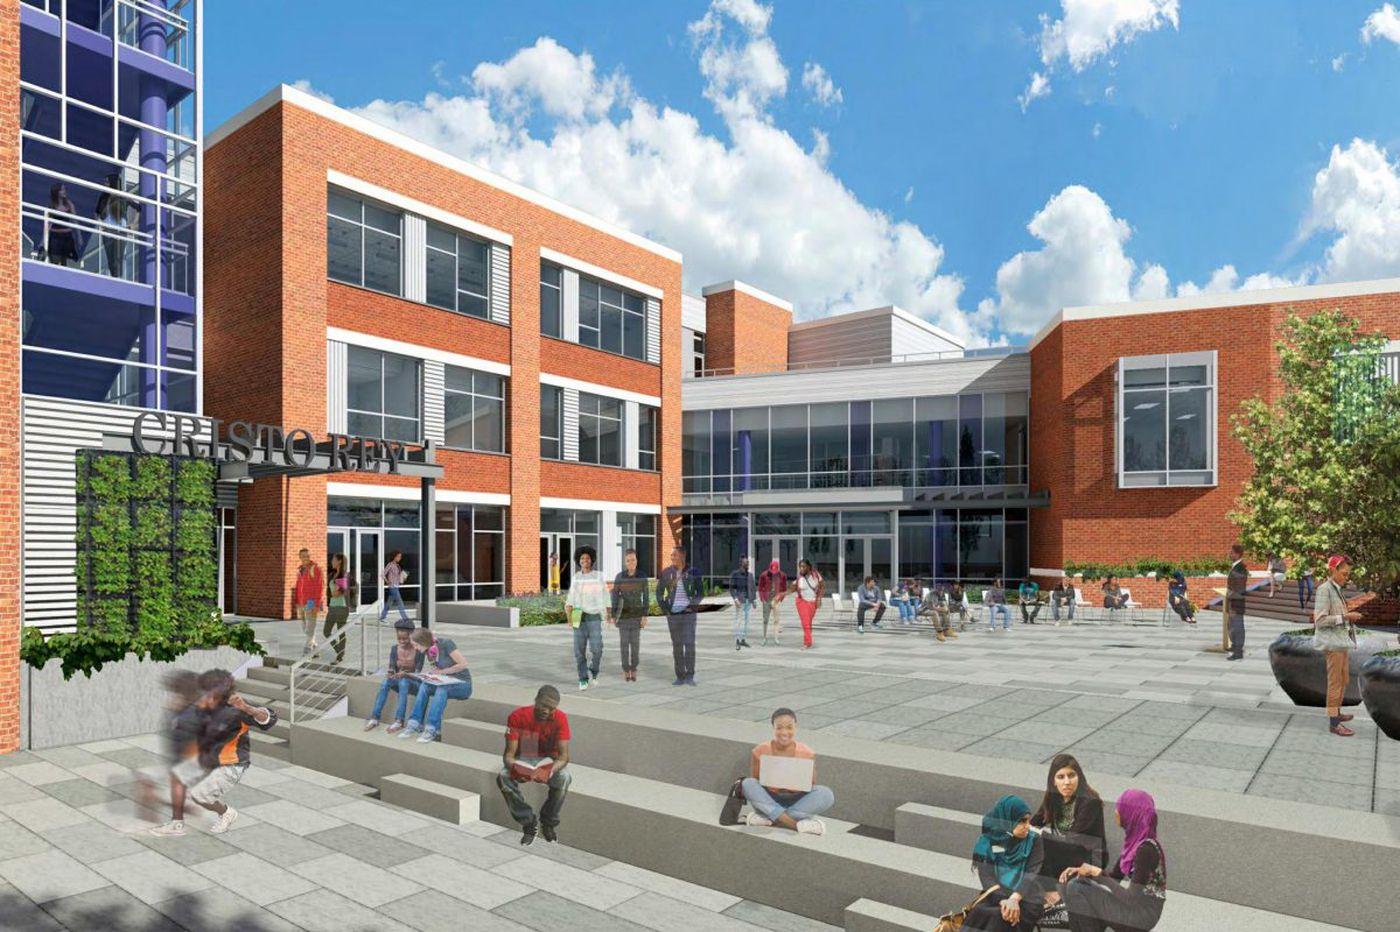 Work starts on new $37M Cristo Rey Catholic high school campus in Tioga